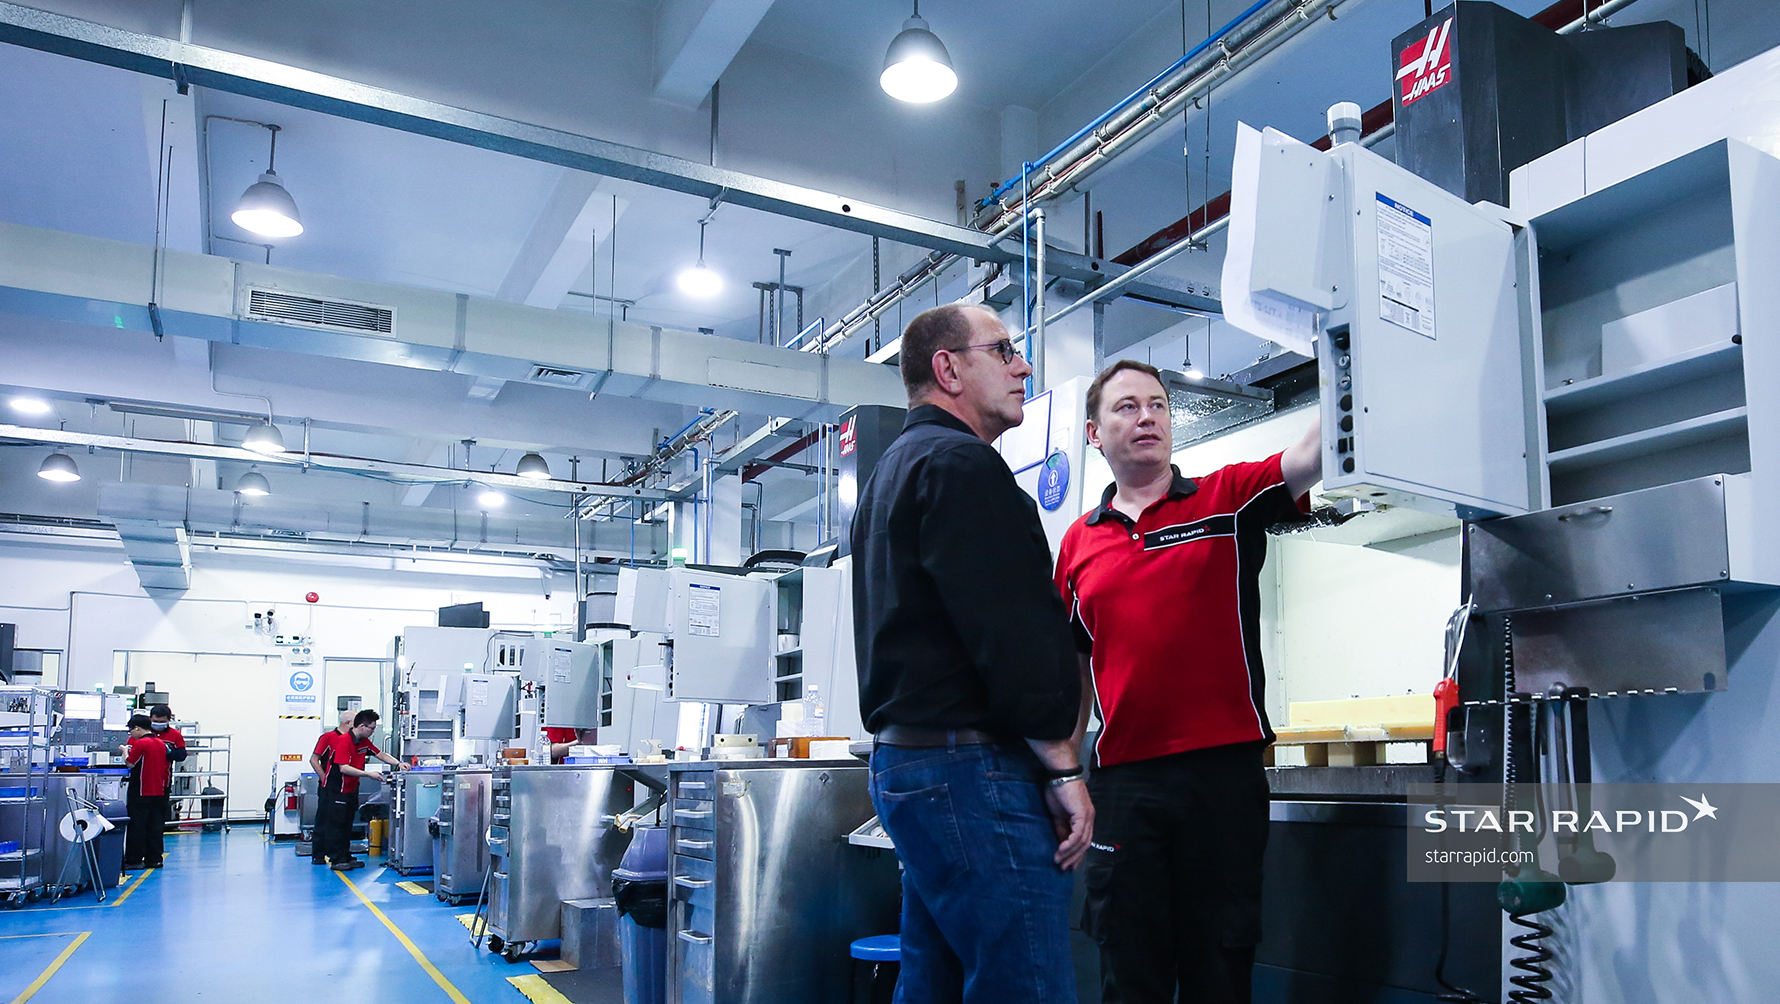 Star Rapid Manufacturing Facilities in Zhongshan